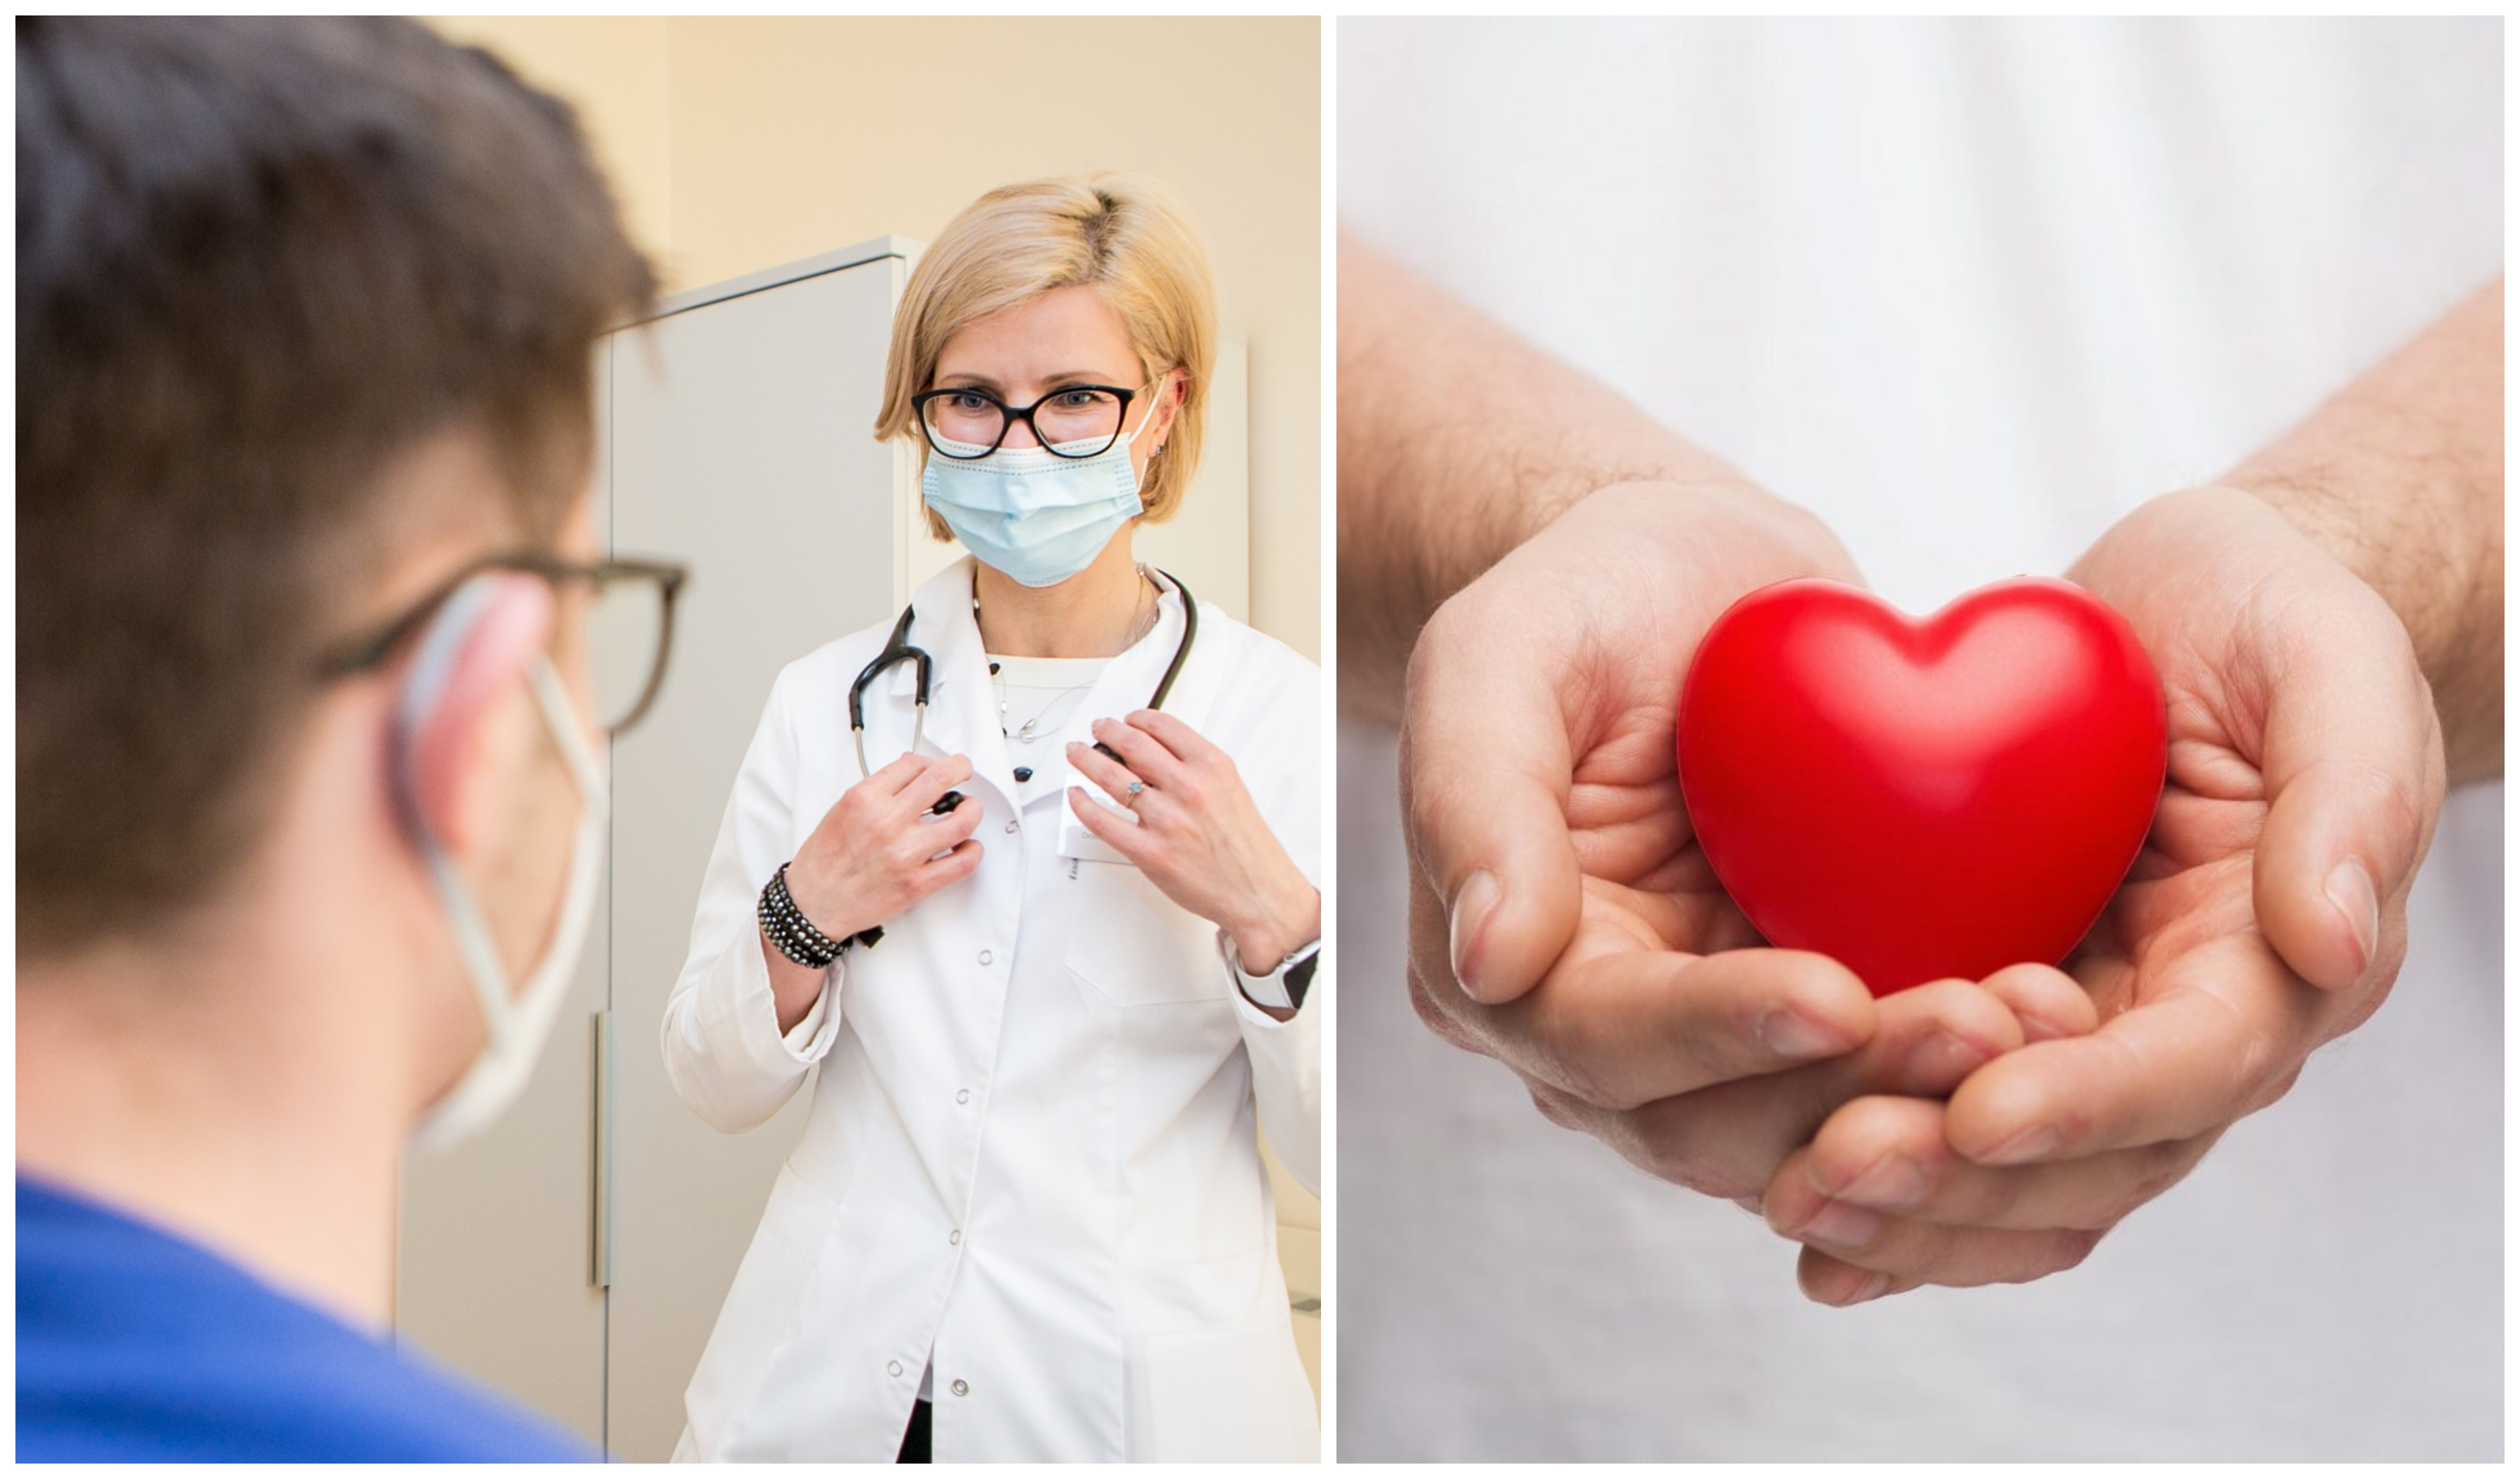 tyli žudiko hipertenzija